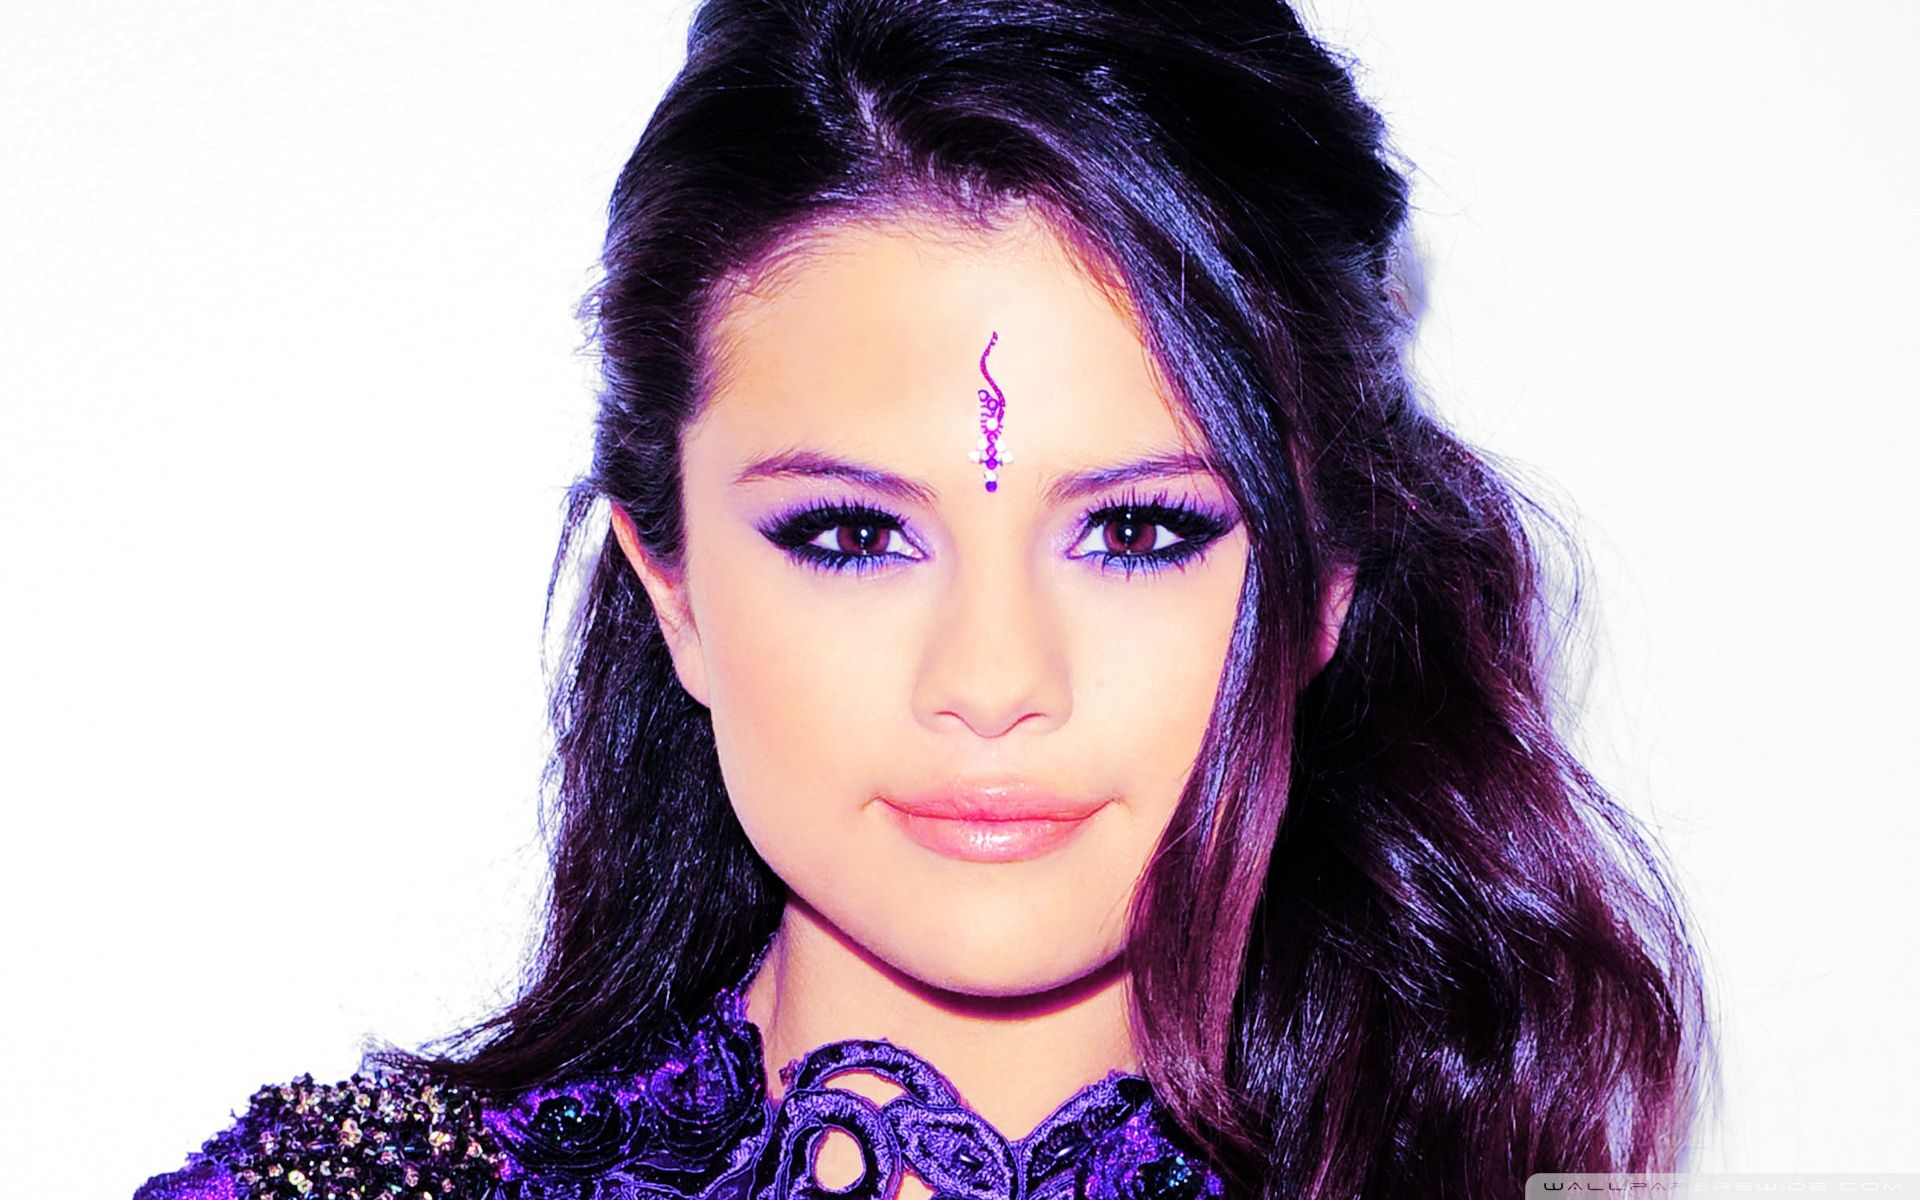 Selena Gomez HD Wallpaper #3